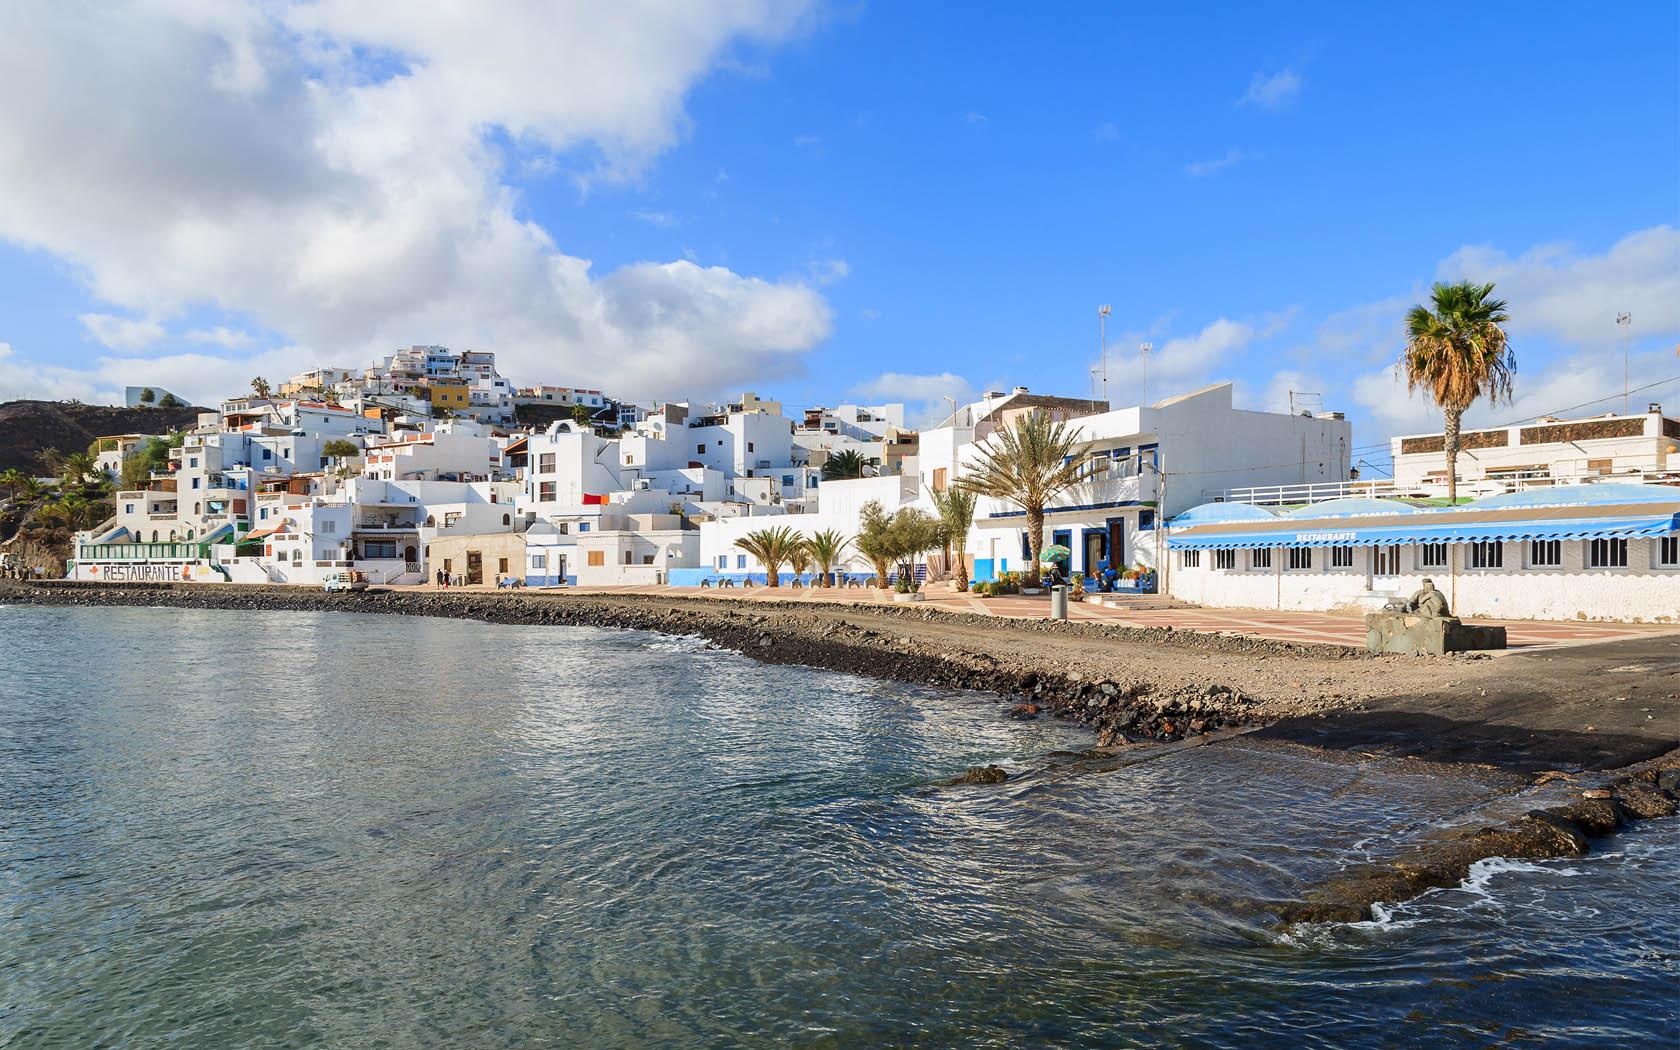 Noleggio Barche Fuerteventura - Navalia   Noleggia un Sogno